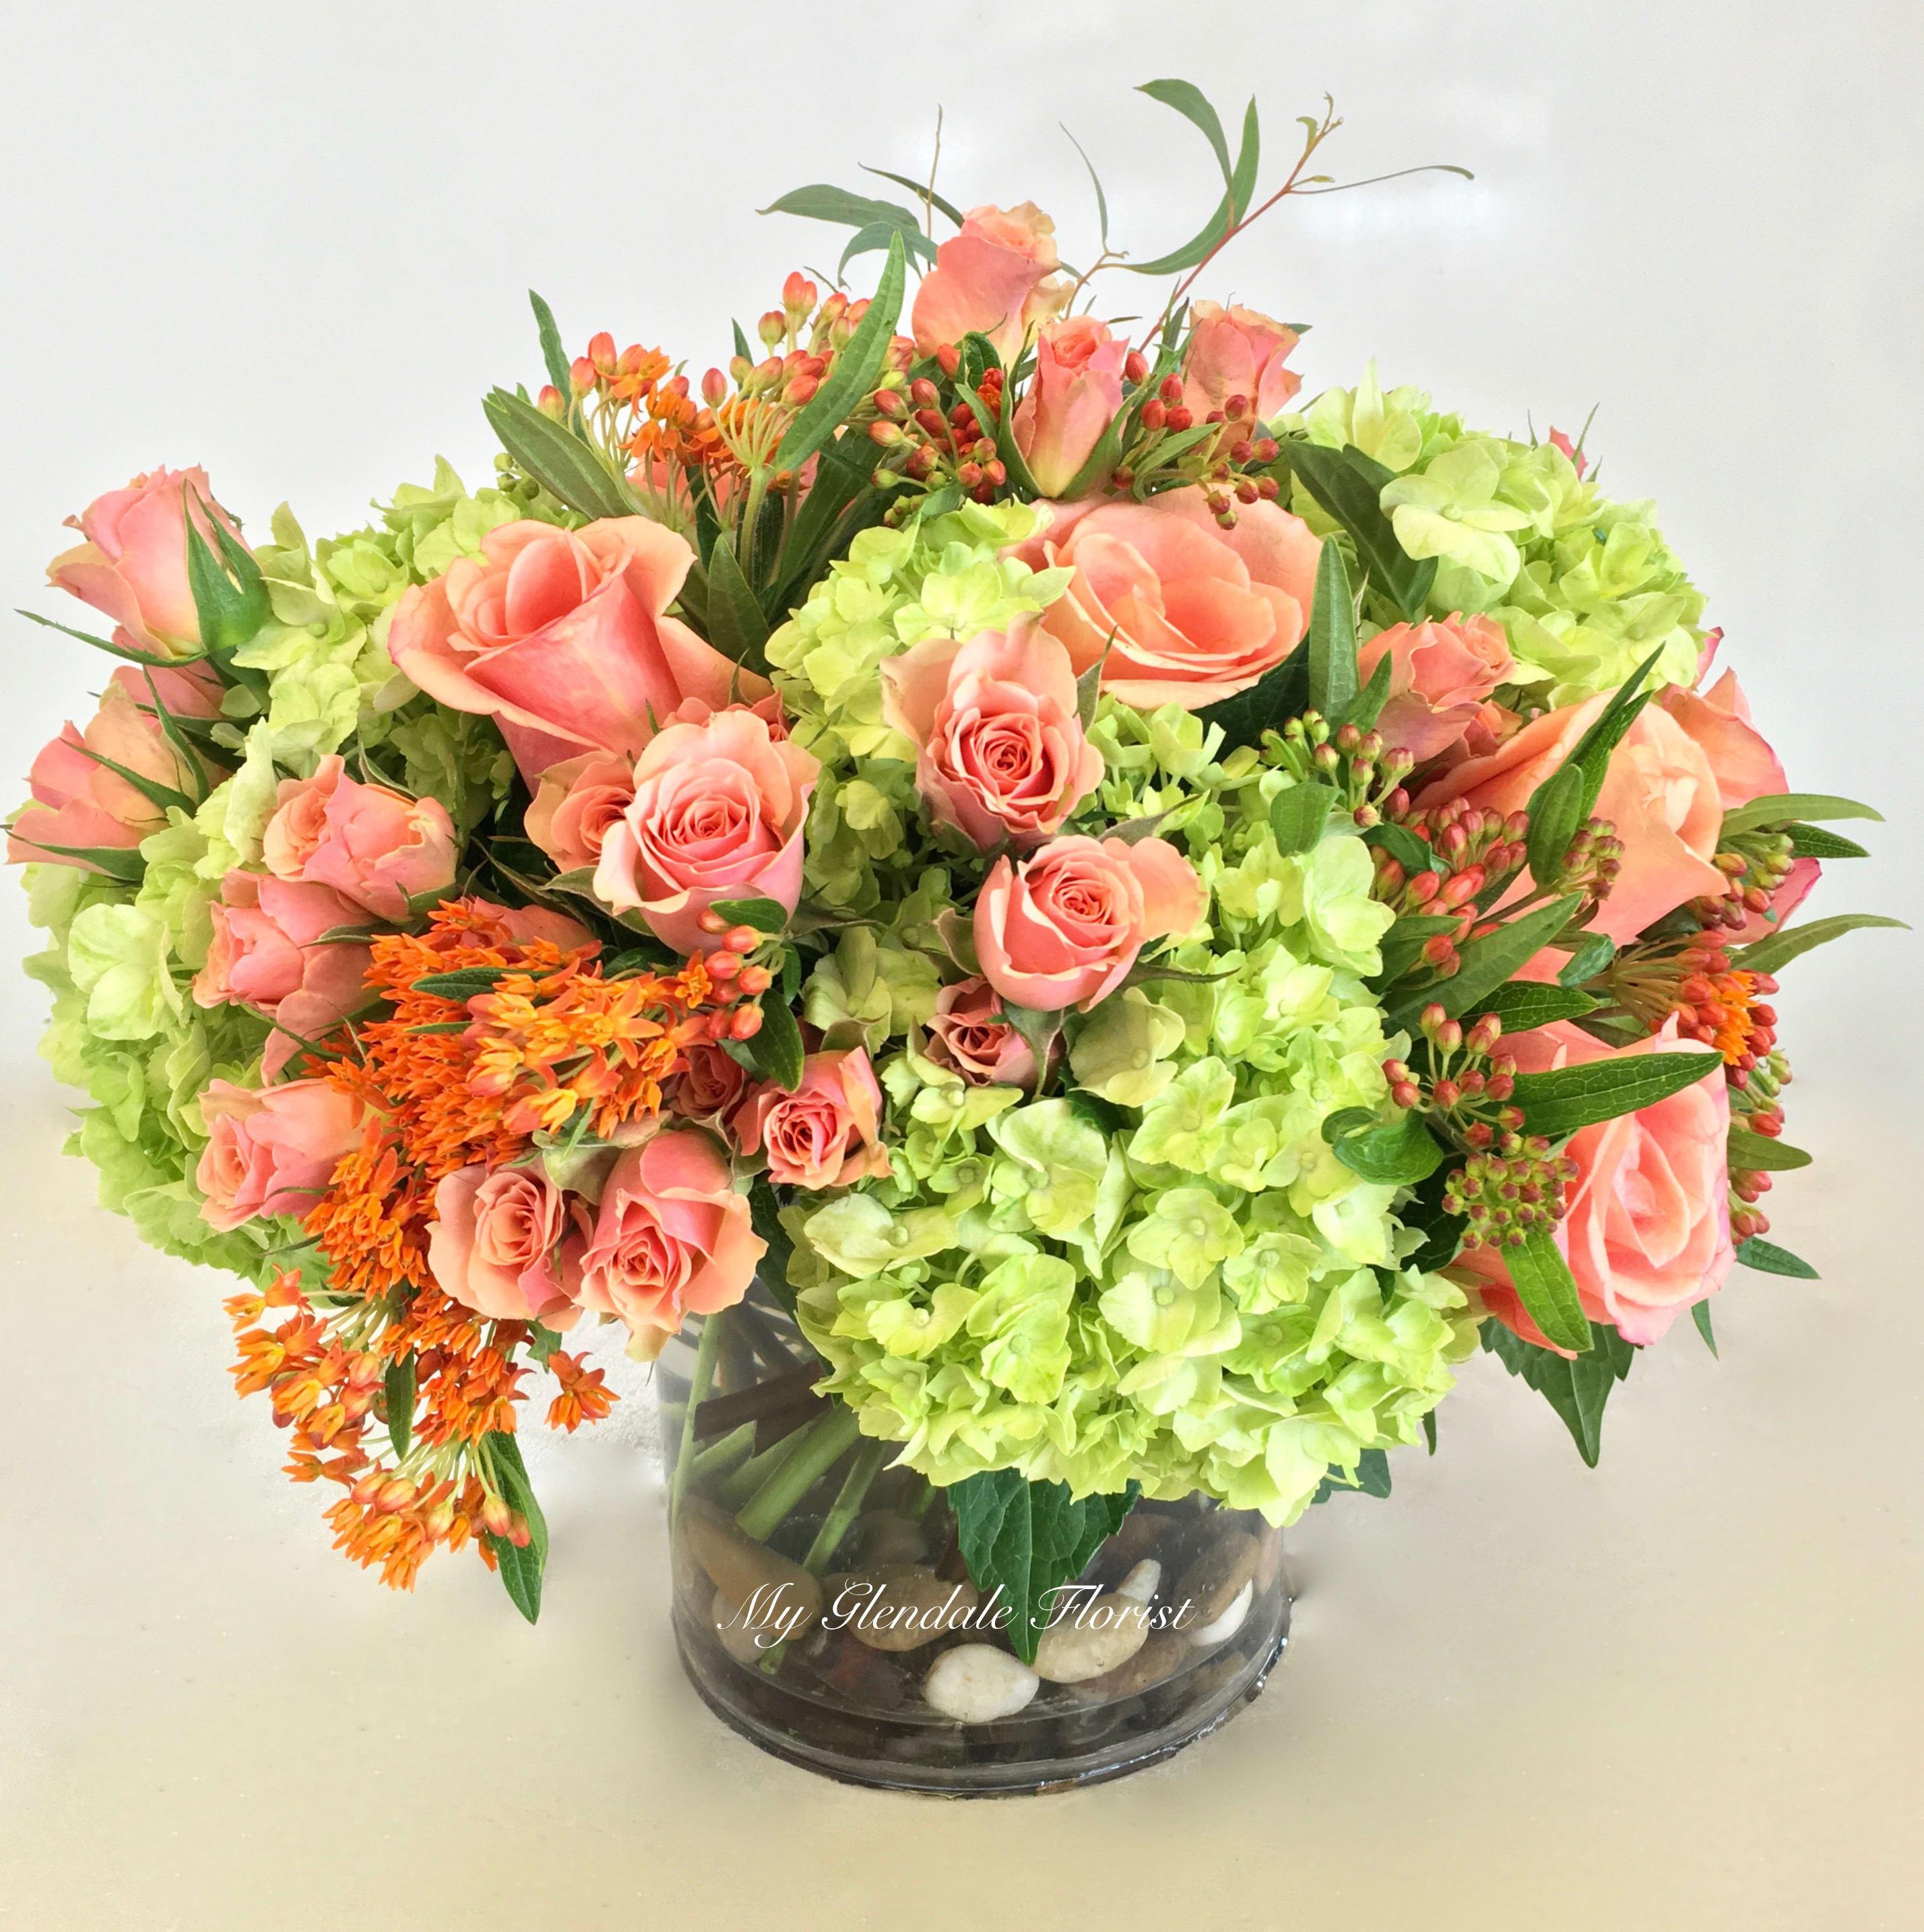 Glendale Florist In Glendale, CA